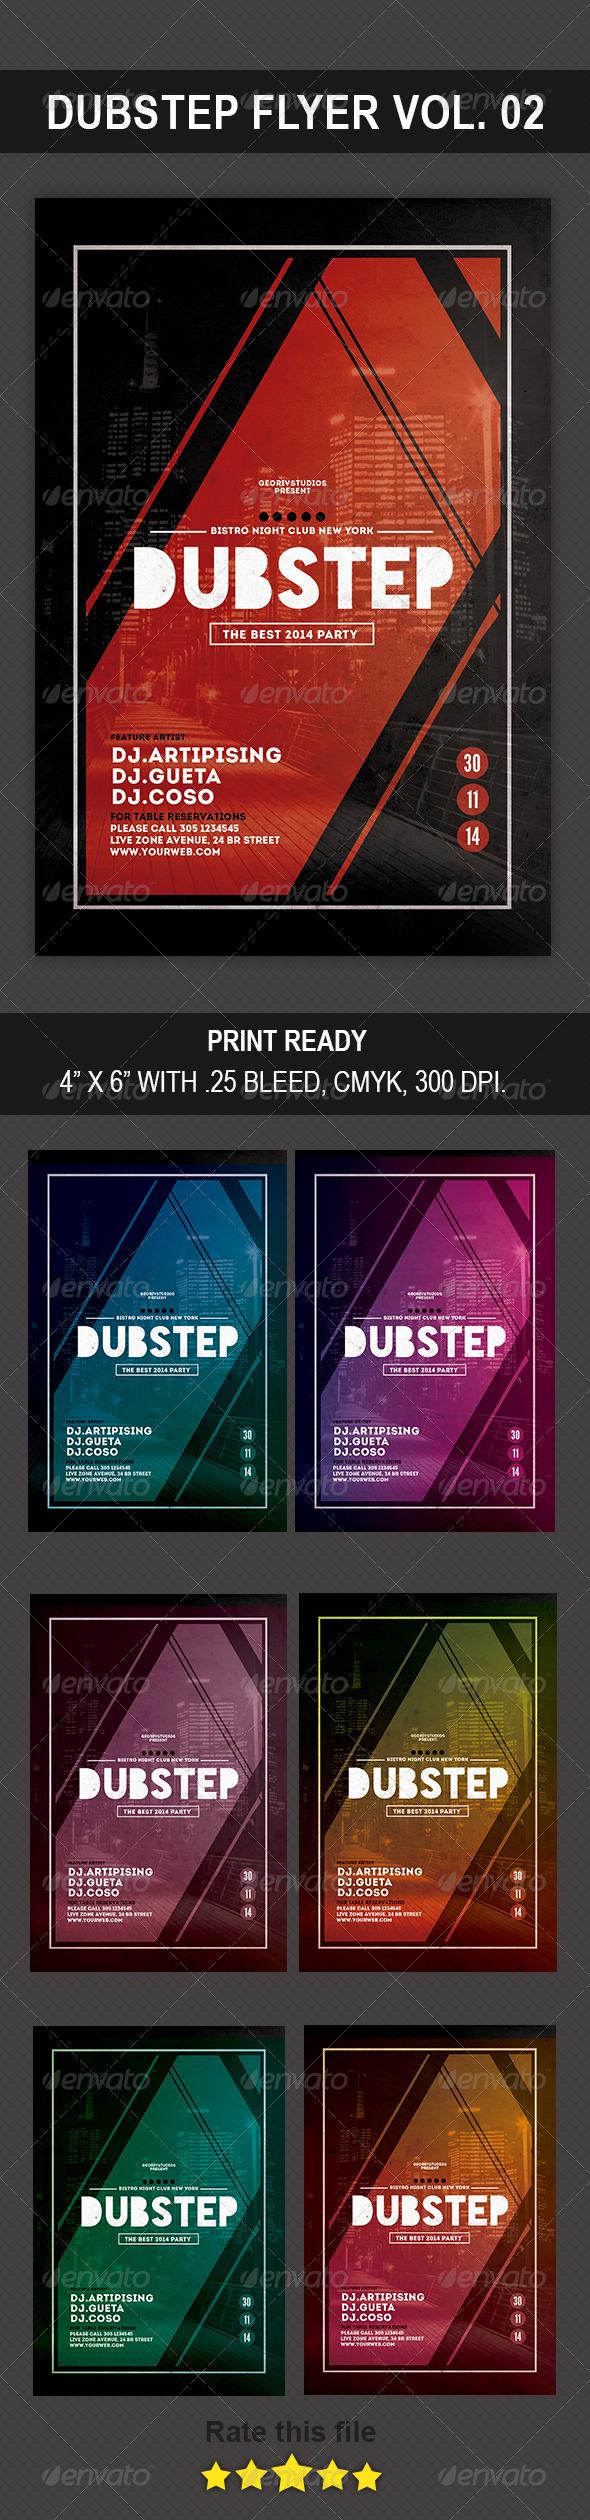 GraphicRiver Dubstep Flyer Vol 02 8771834